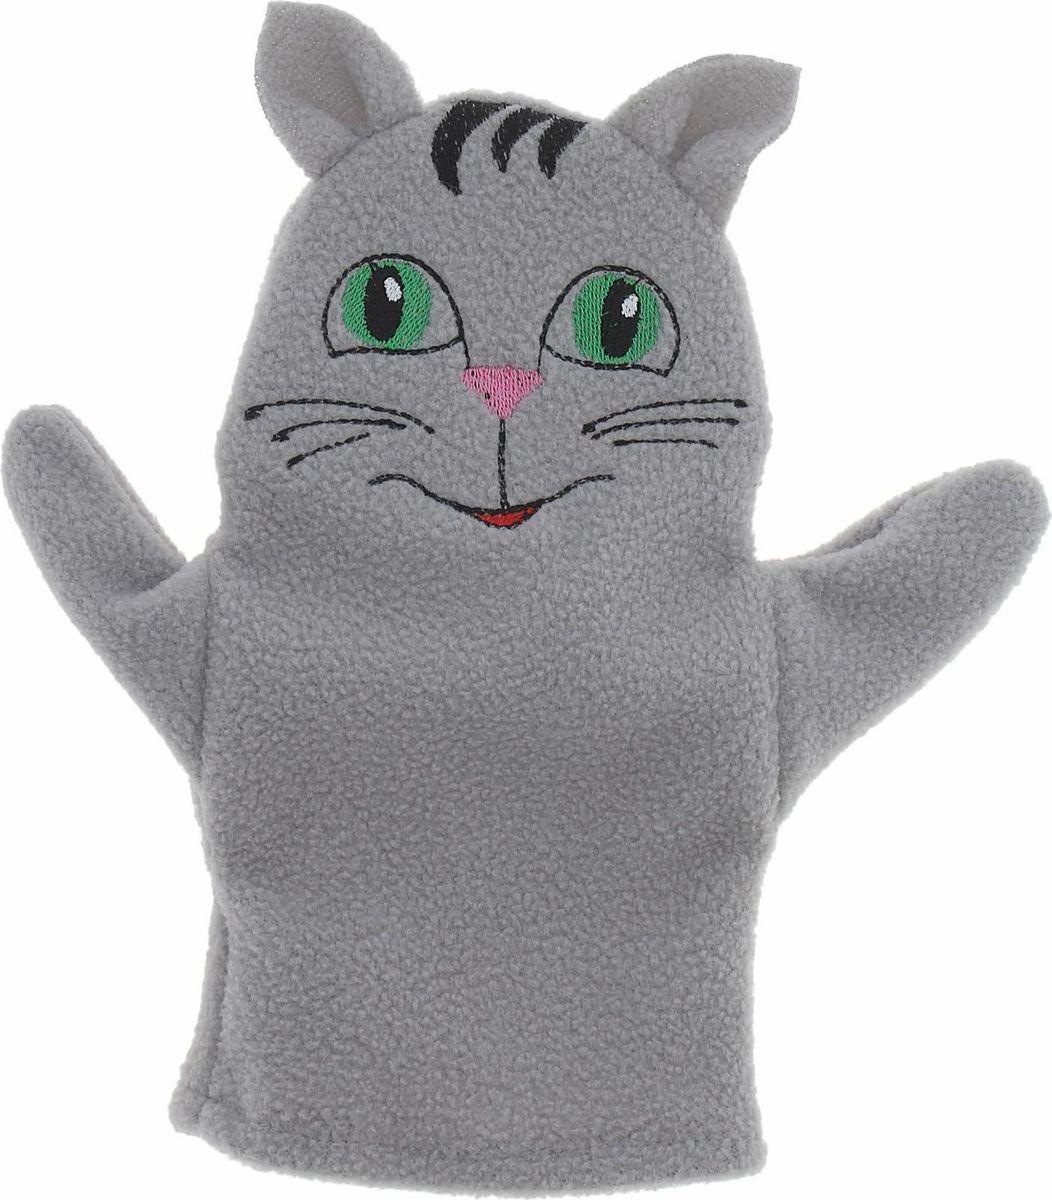 Sima-land Игрушка на руку Кошка sima land кукла на руку волк